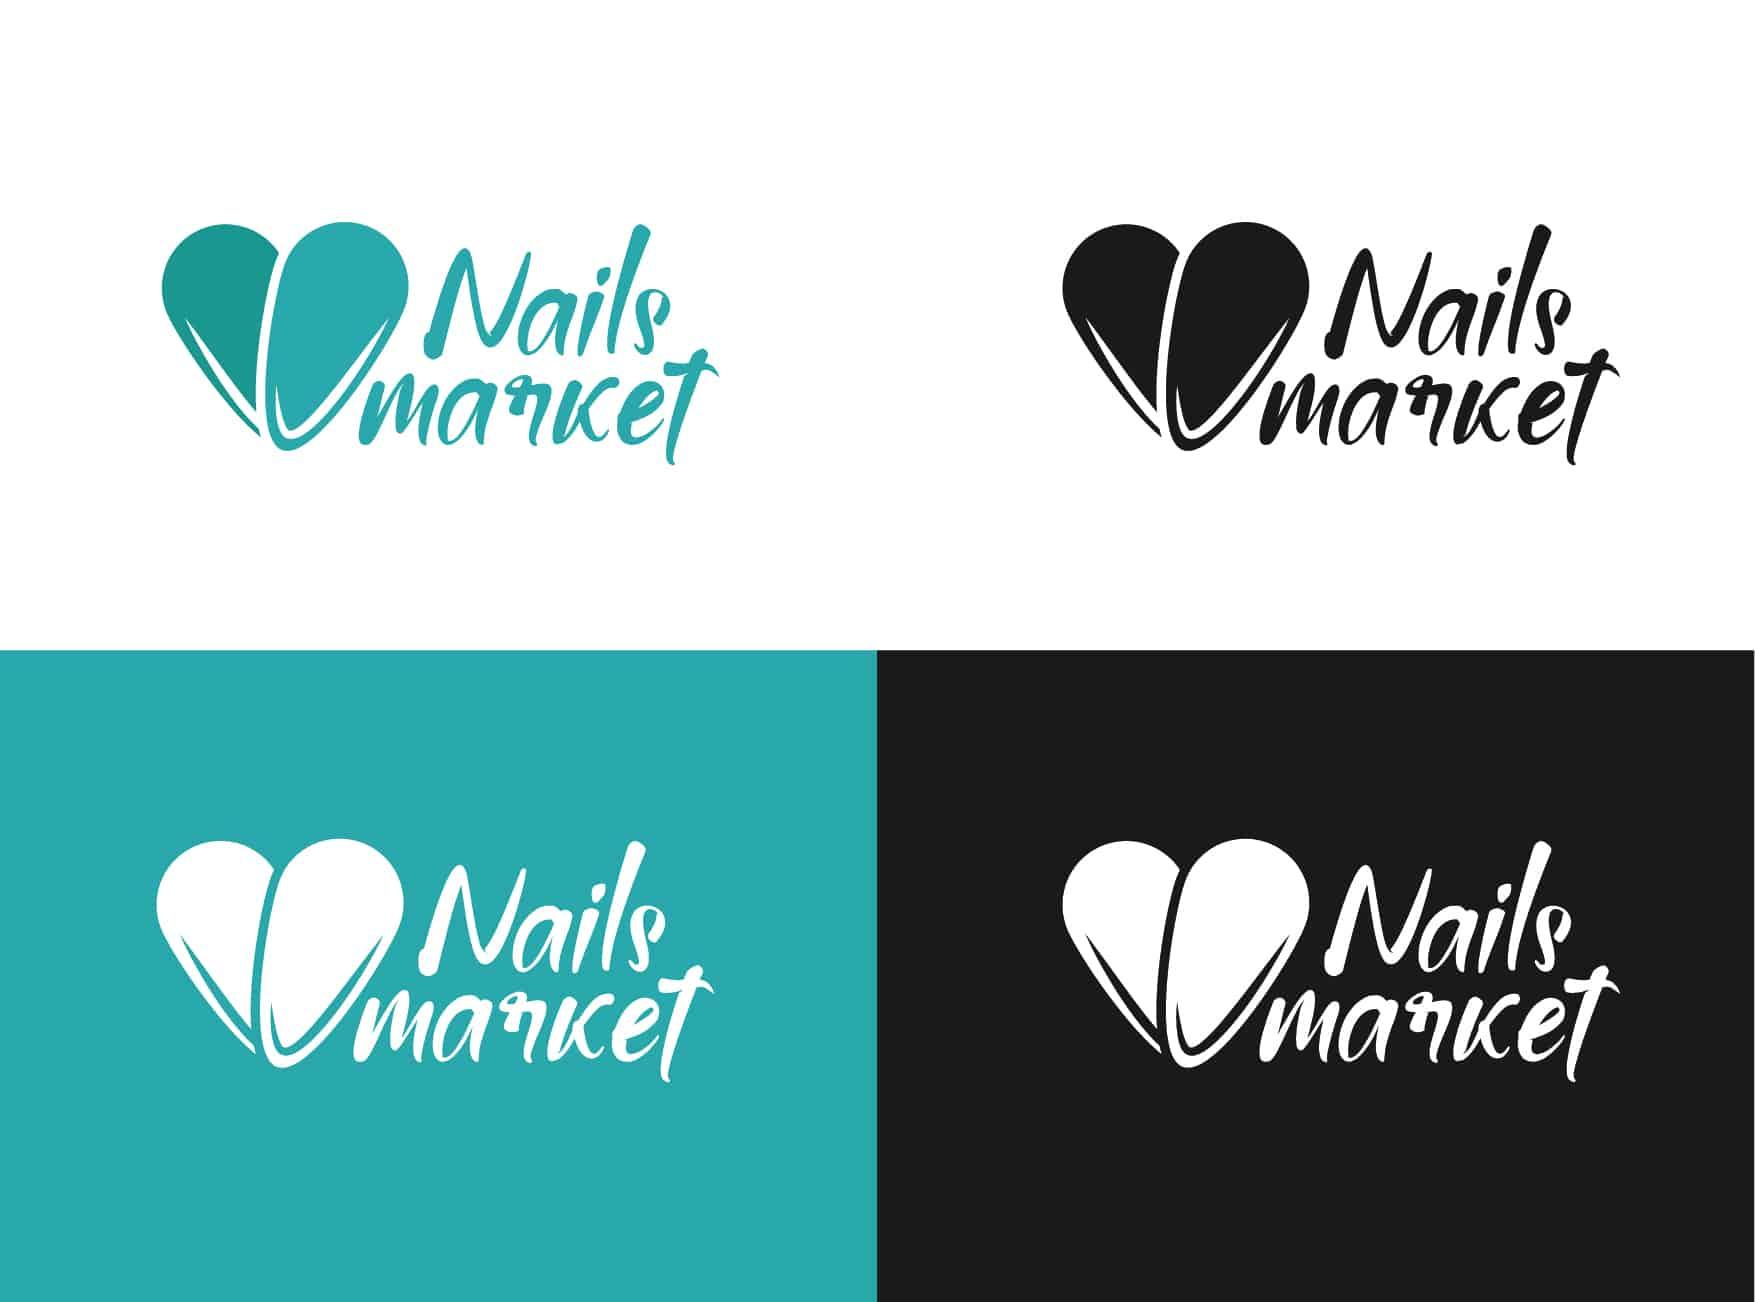 разработка логотипа для ногтевого сервиса